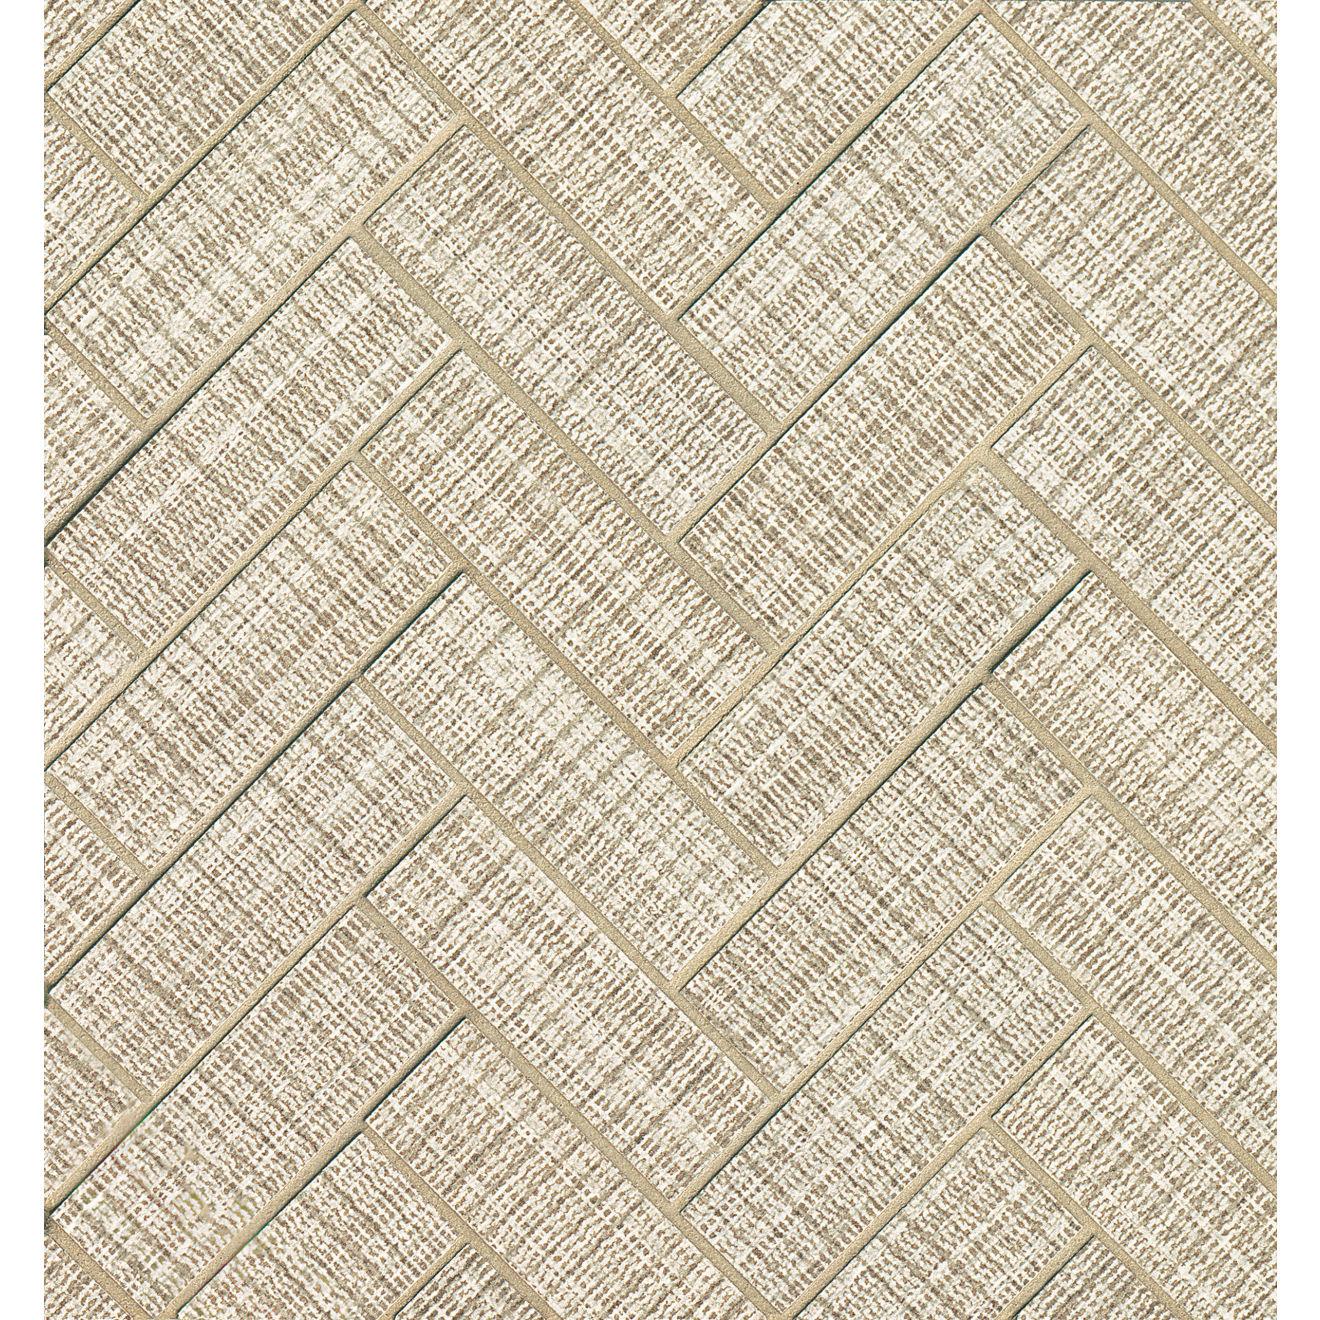 Tailor Art Floor & Wall Mosaic in Sand